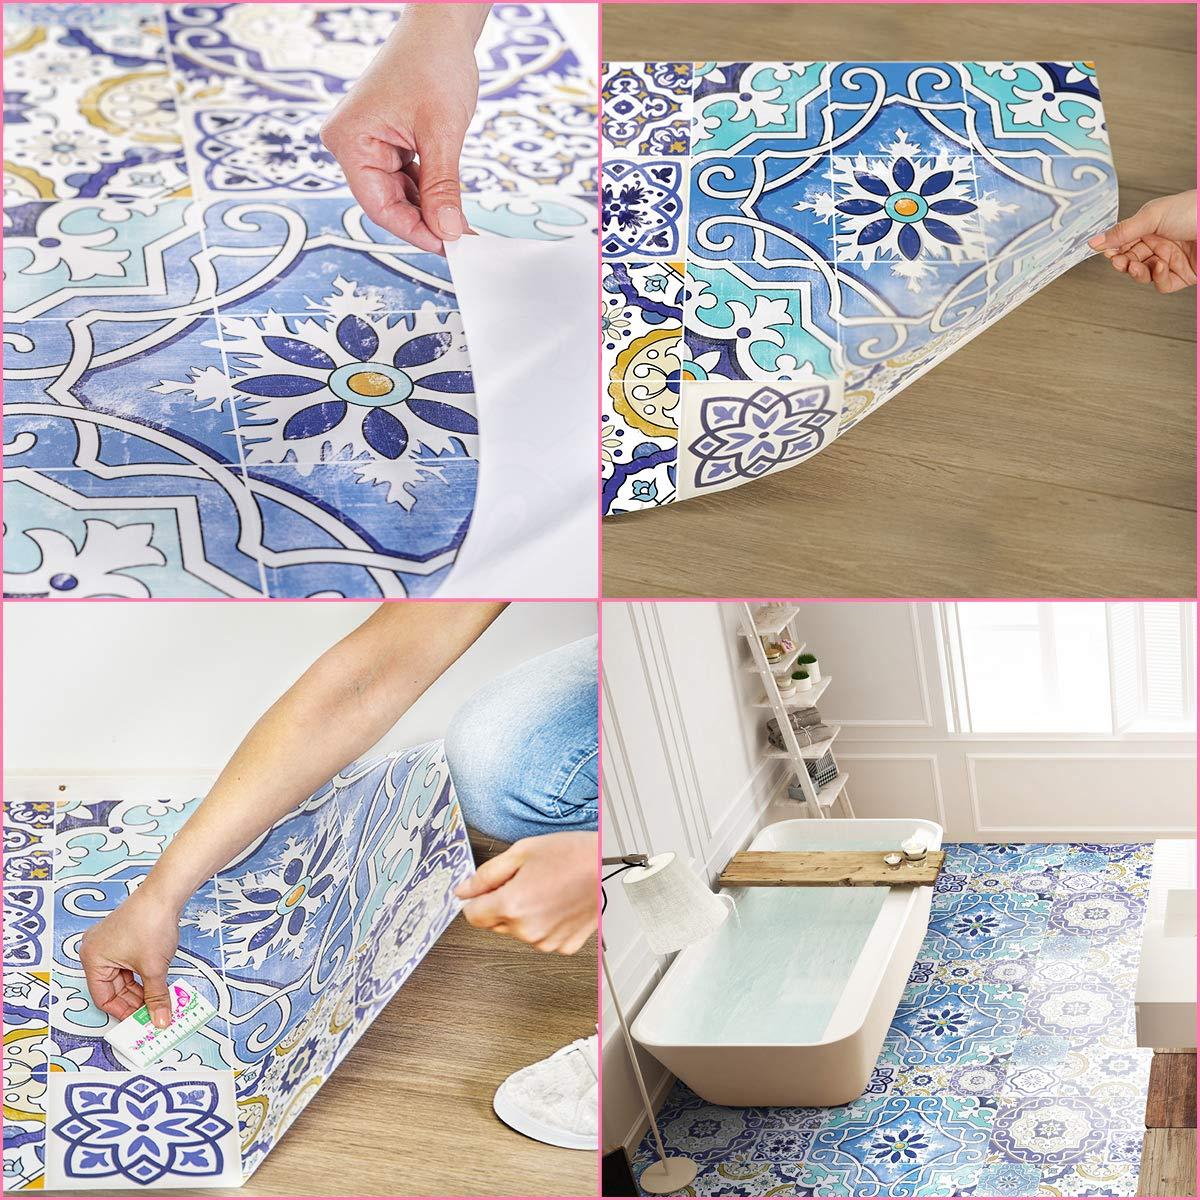 Bricolage Stickers Carrelage 60 X 90 Cm 1 Stickers Adhesifs Carrelages Azulejos Revetement De Sol Anti Derapant 1 Piece